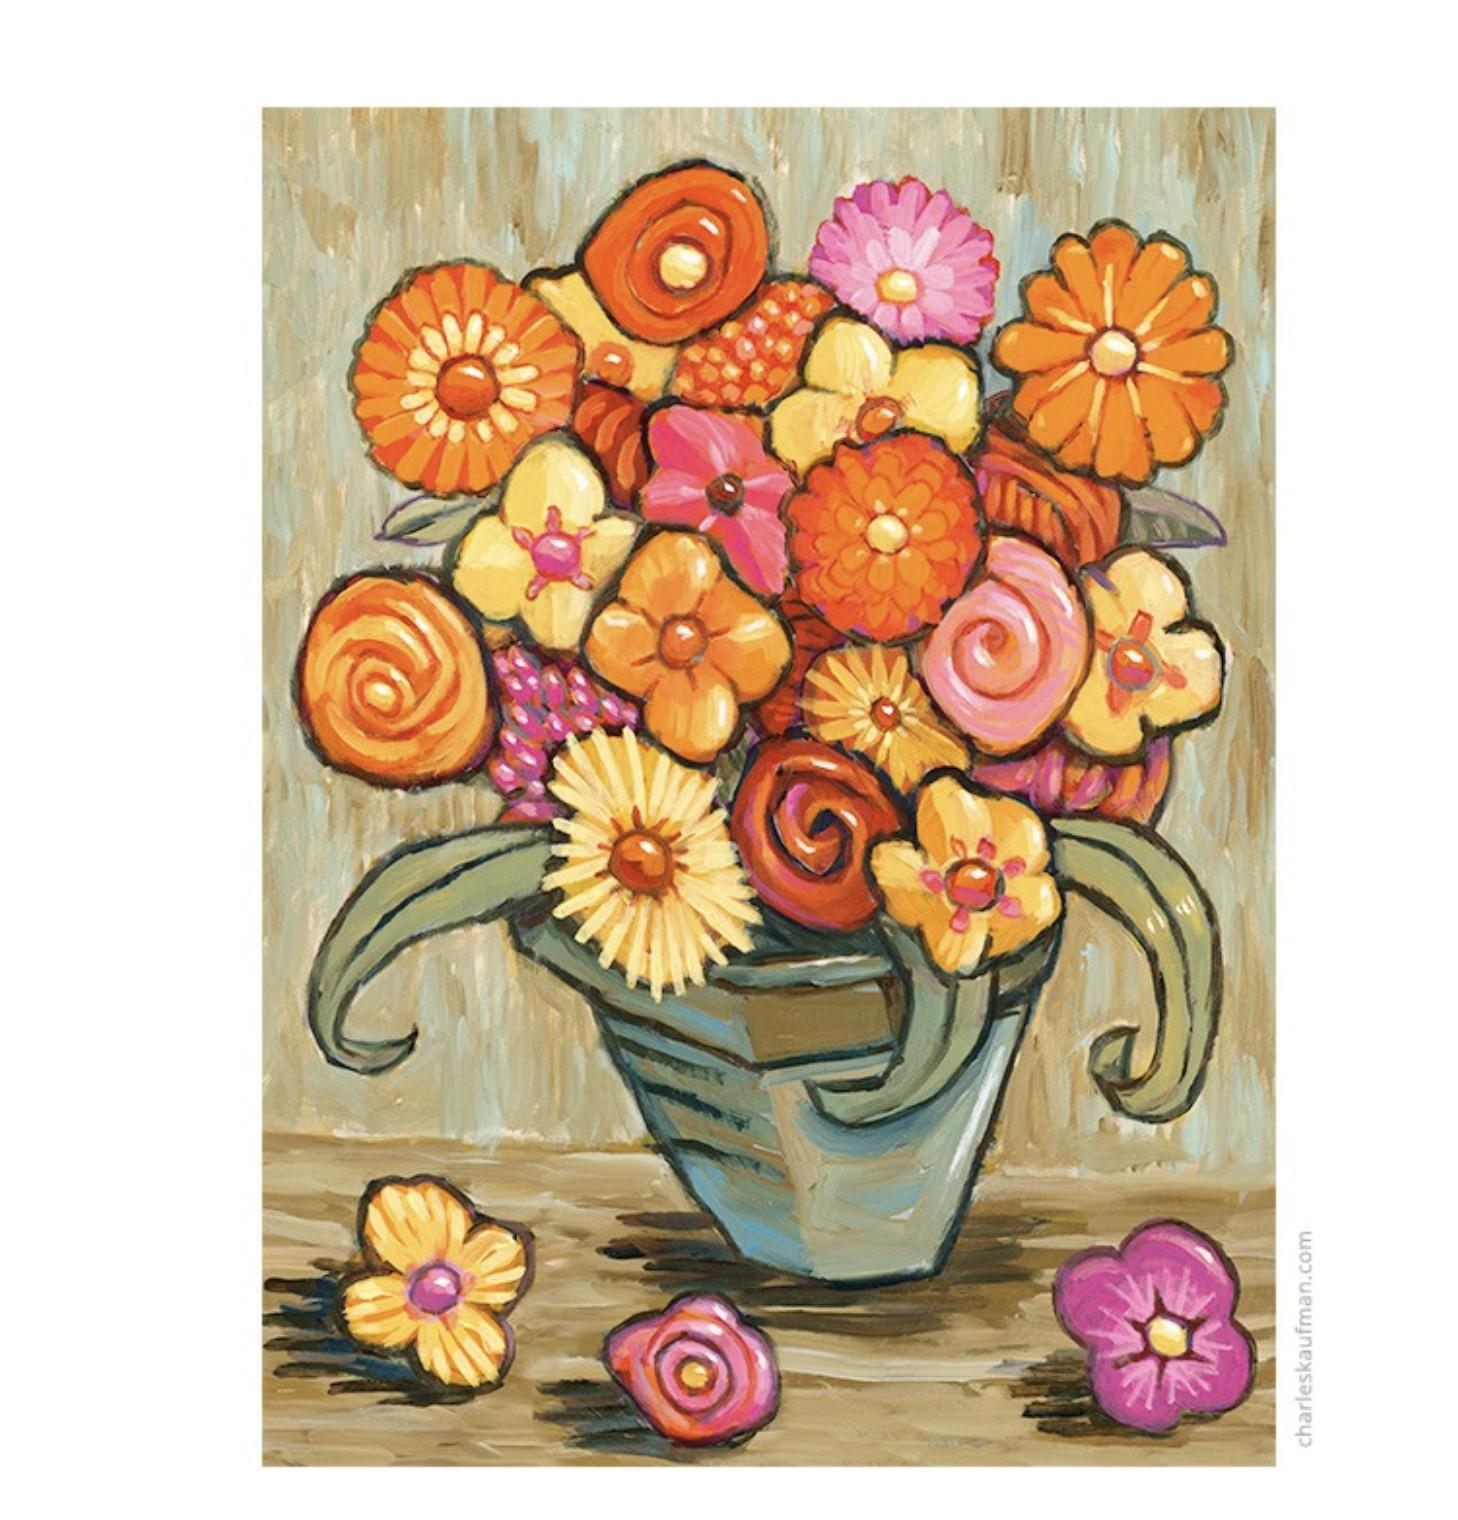 Bouquet of Flowers - Kaufmann, Charles - k-CHK395